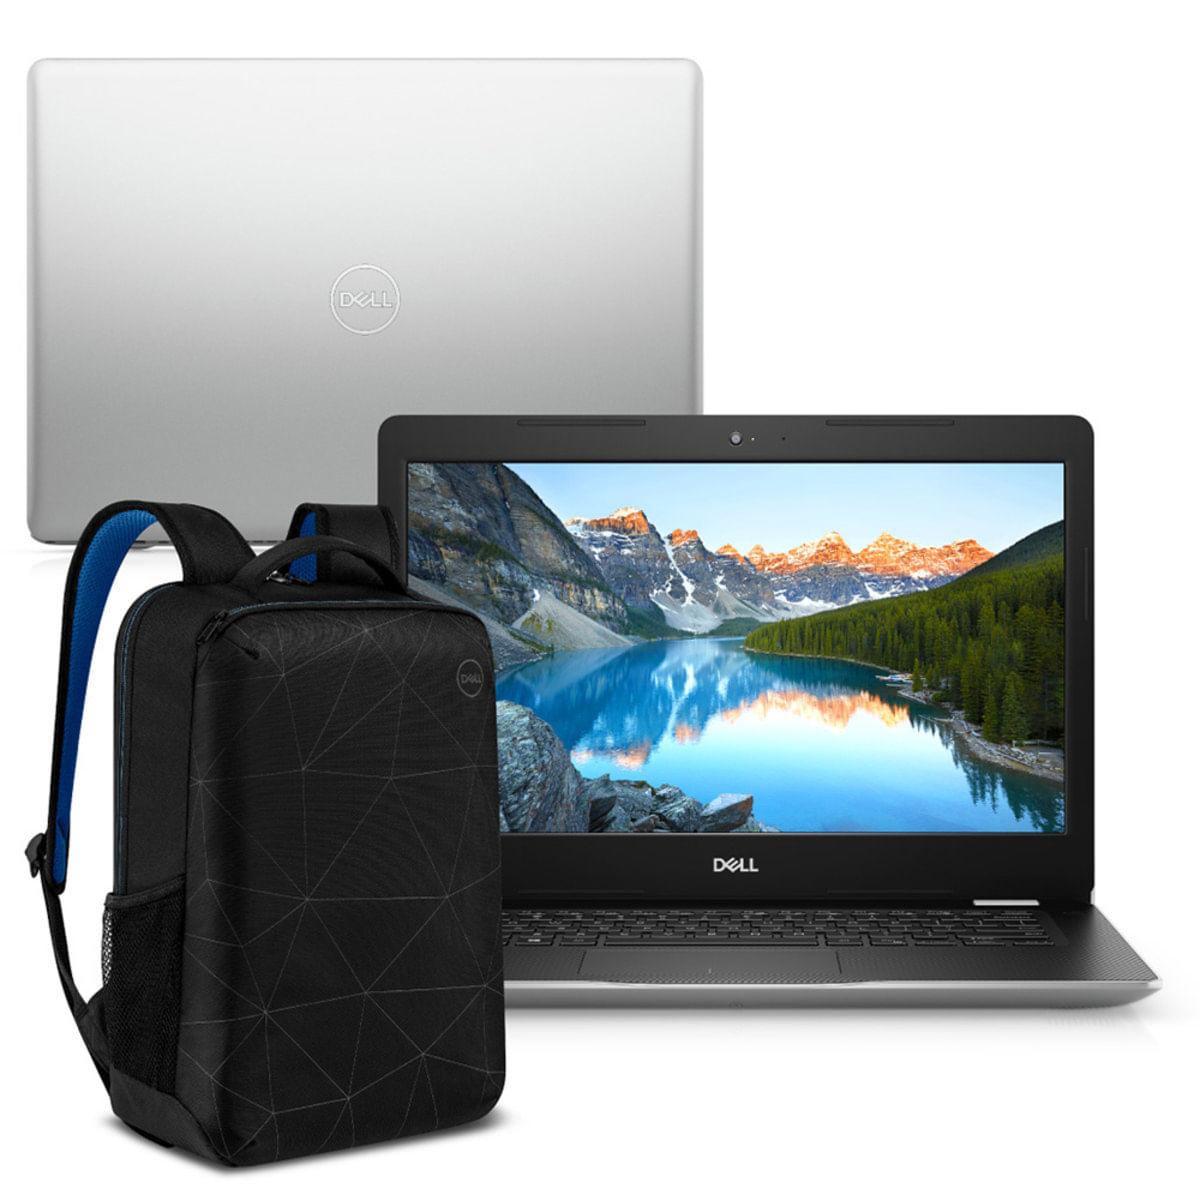 "Notebook - Dell I14-3481-m40sb I3-8130u 2.20ghz 4gb 128gb Ssd Intel Hd Graphics 620 Windows 10 Home Inspiron 14"" Polegadas"